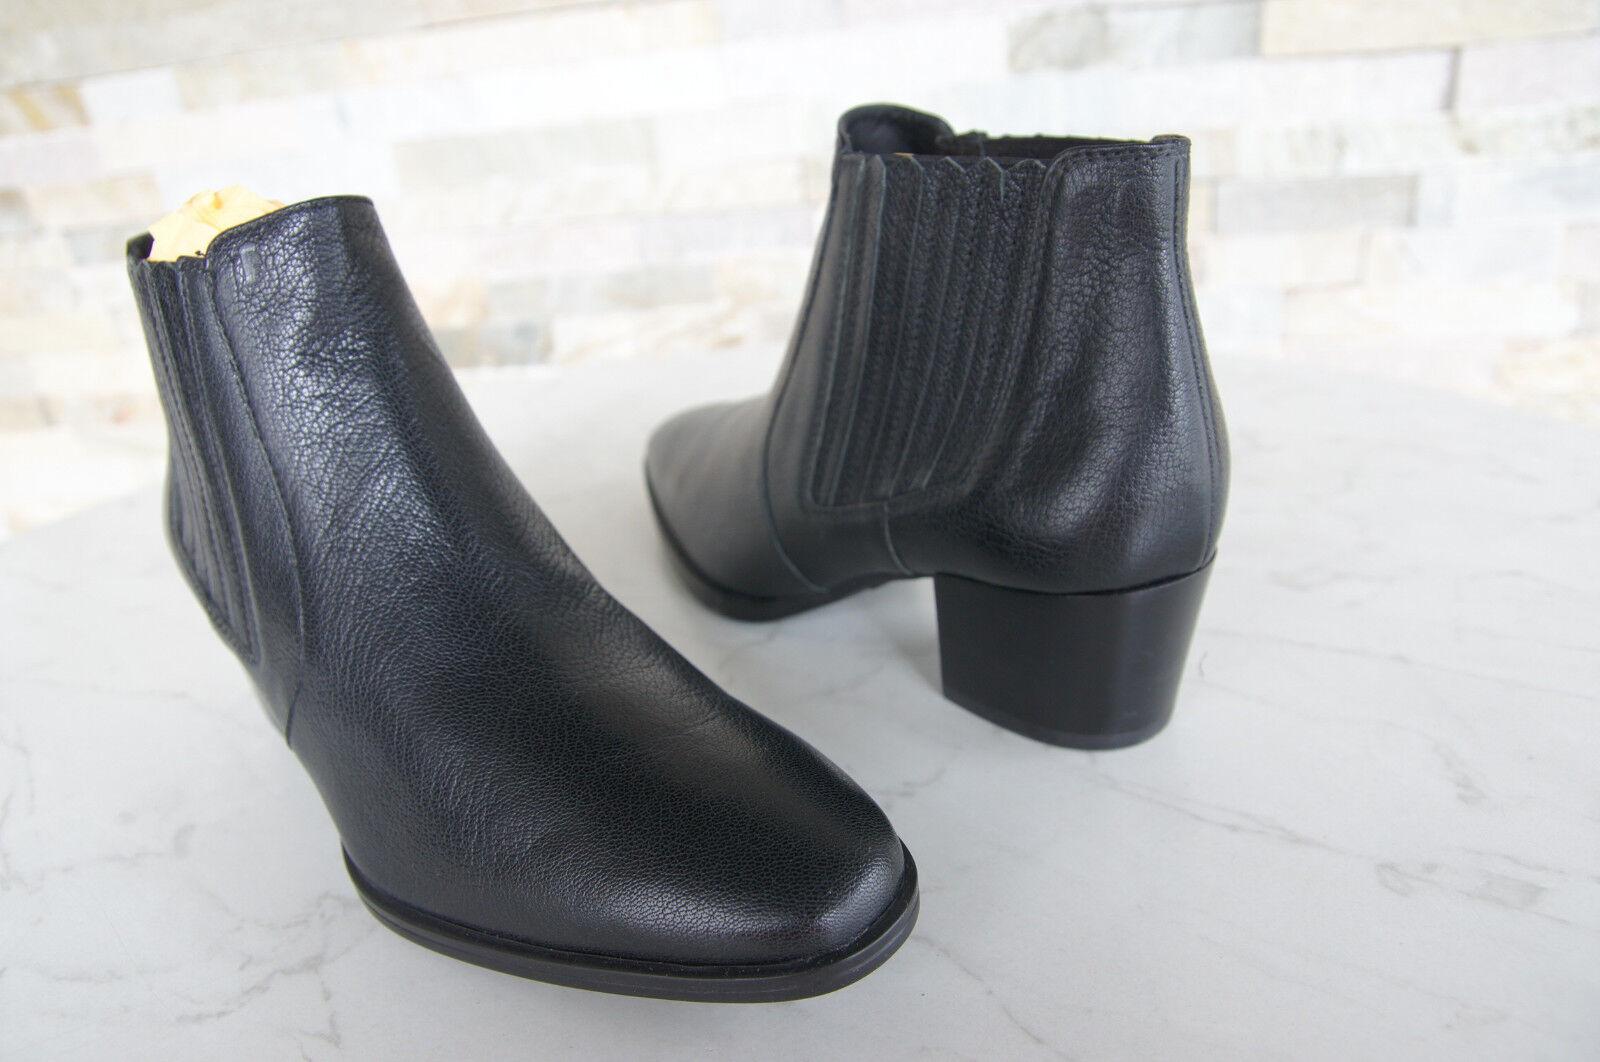 Tods Tod´s Stiefeletten Gr 37 schwarz Ankle Booties Stiefel Schuhe schwarz 37 neu ee6857